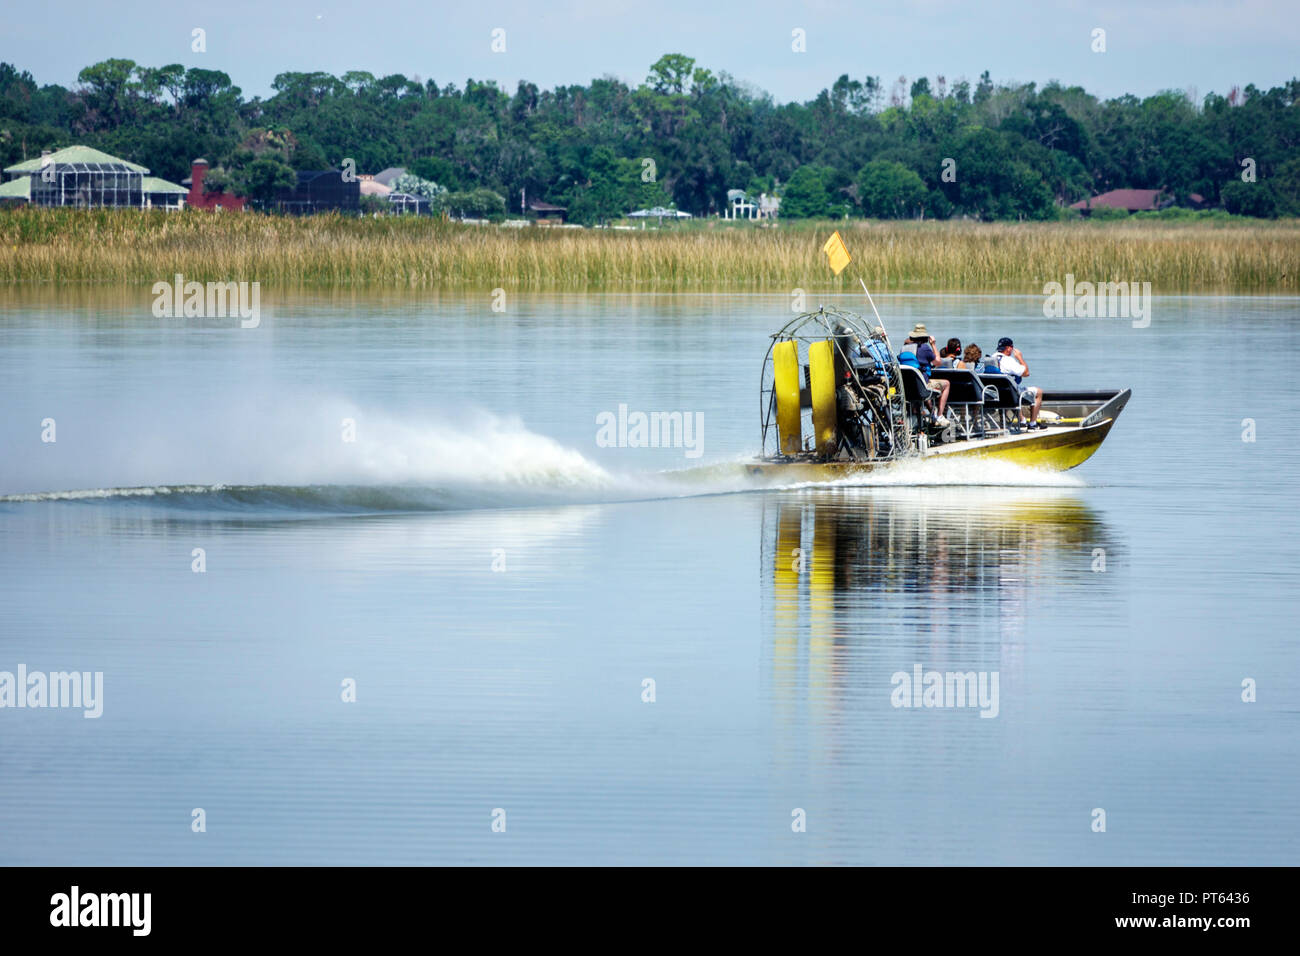 Florida Lake Hamilton water sawgrass boat airboat ride - Stock Image